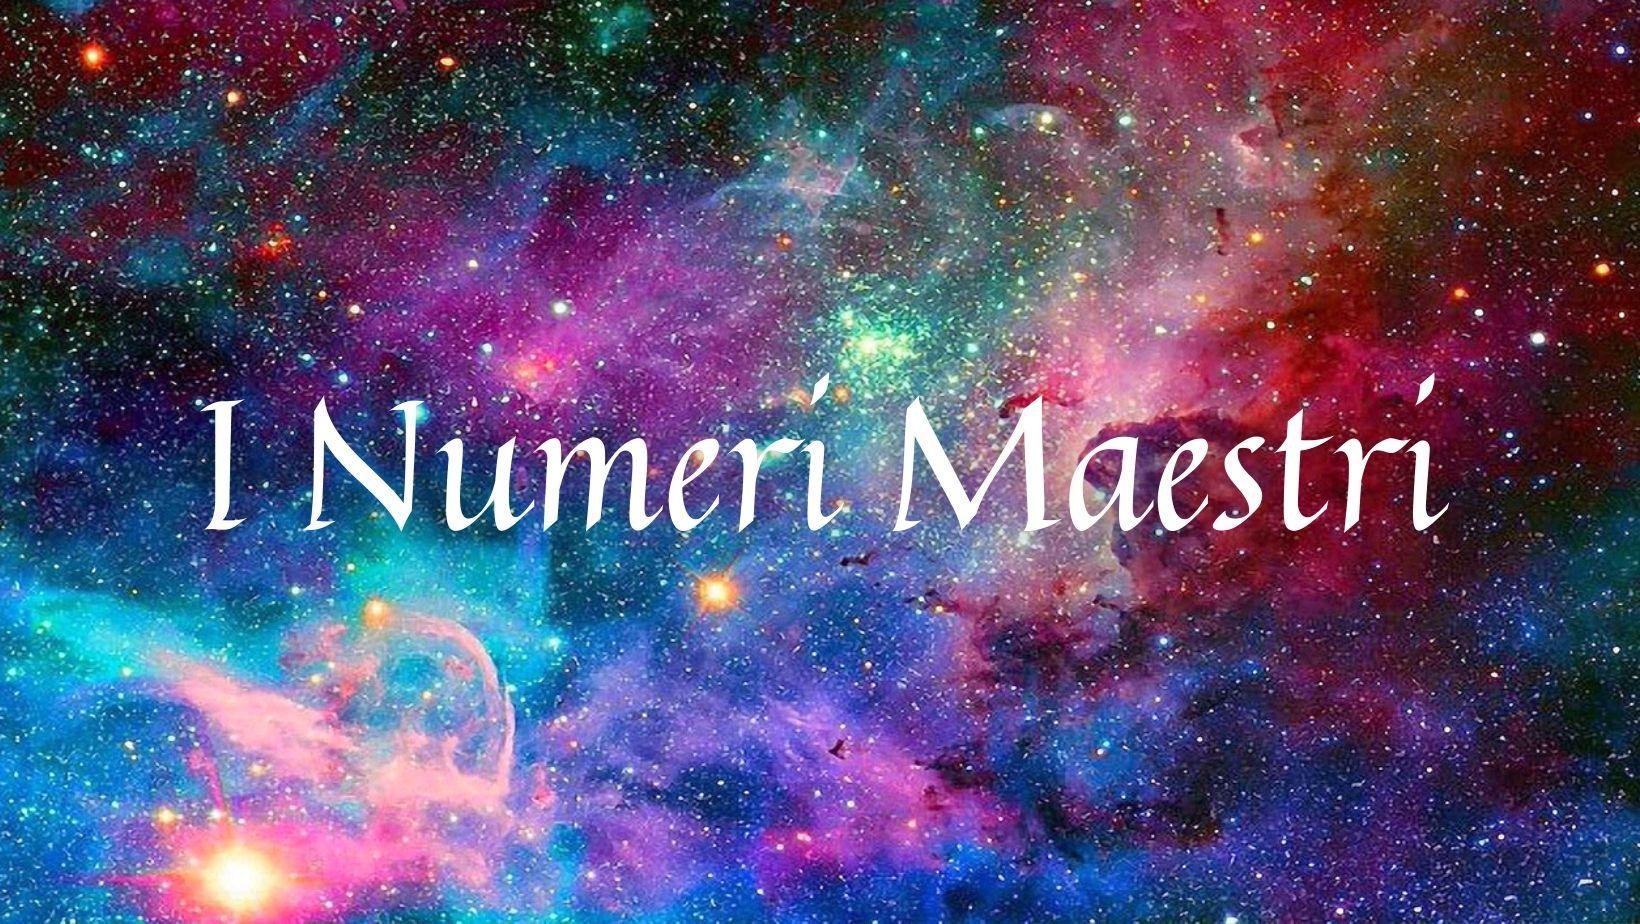 Numerologia: I Numeri Maestri